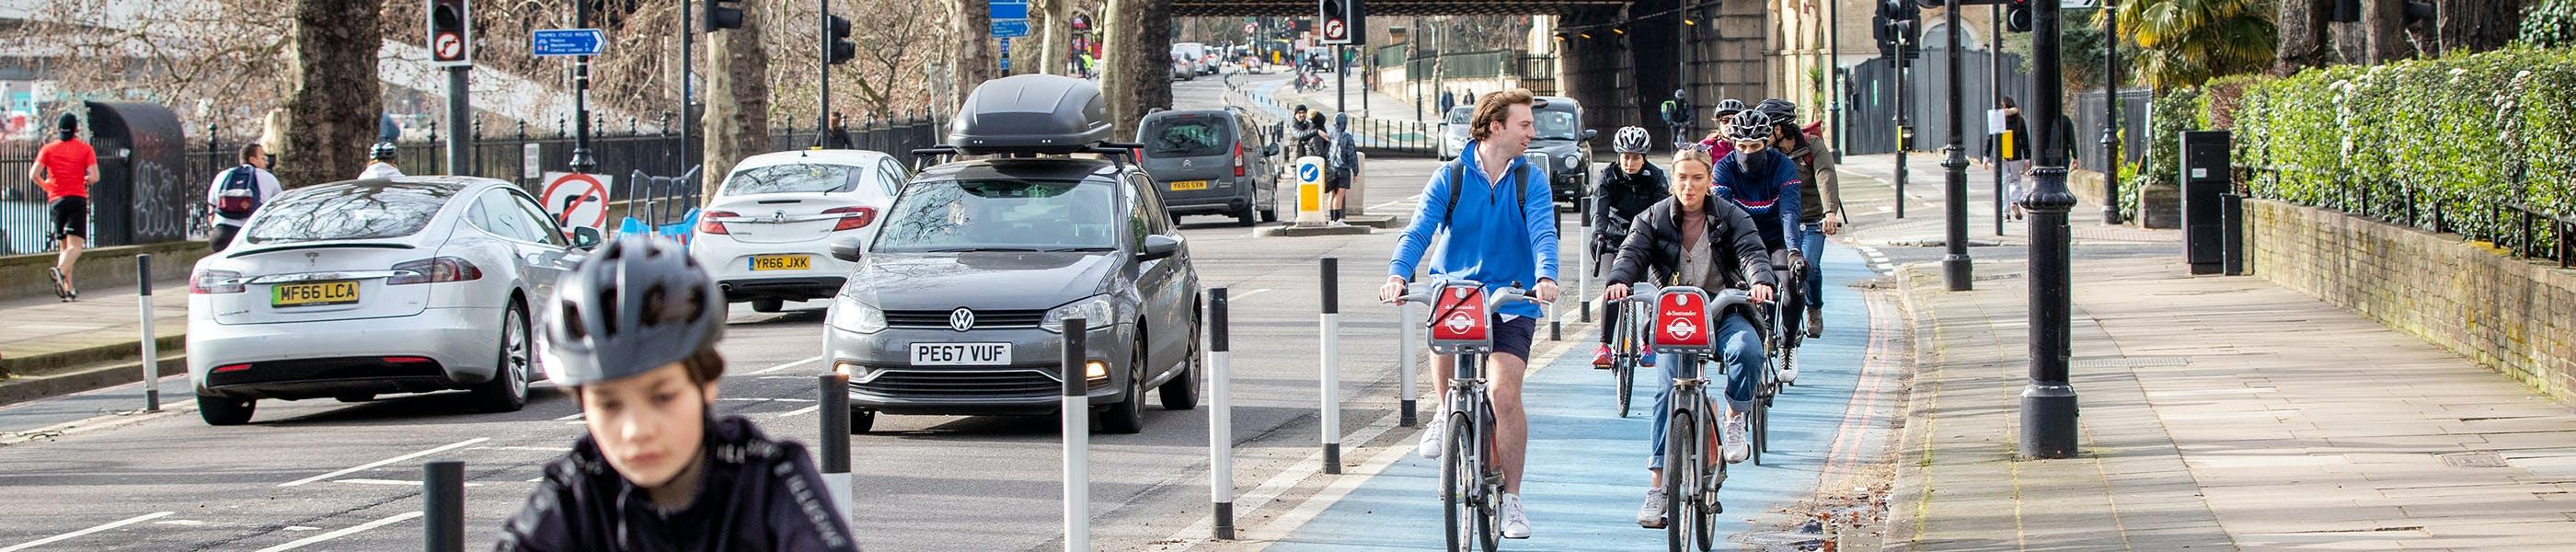 People cycling along CS8 cycleway